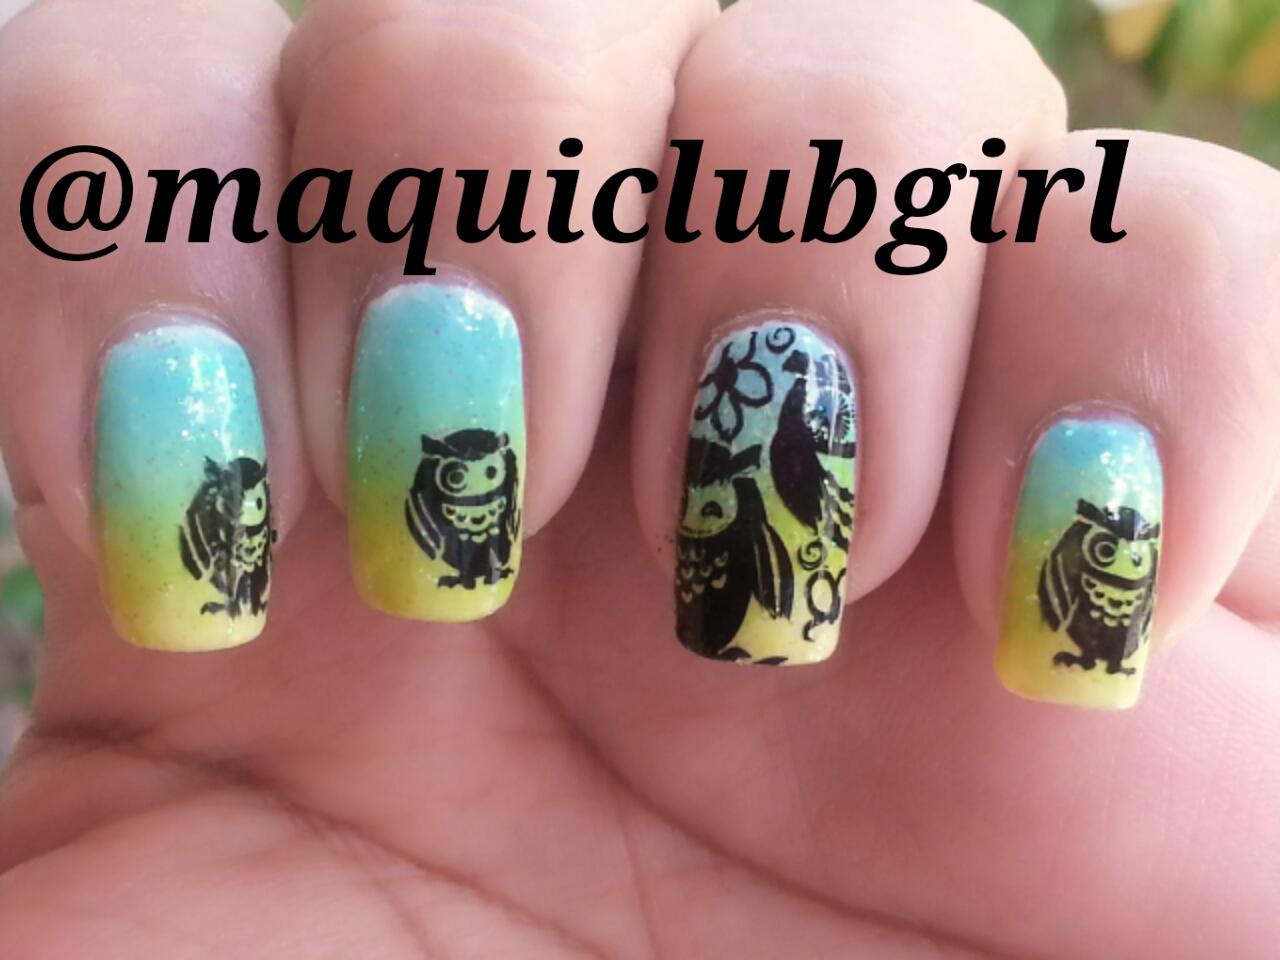 MAQUICLUB GIRL: junio 2013